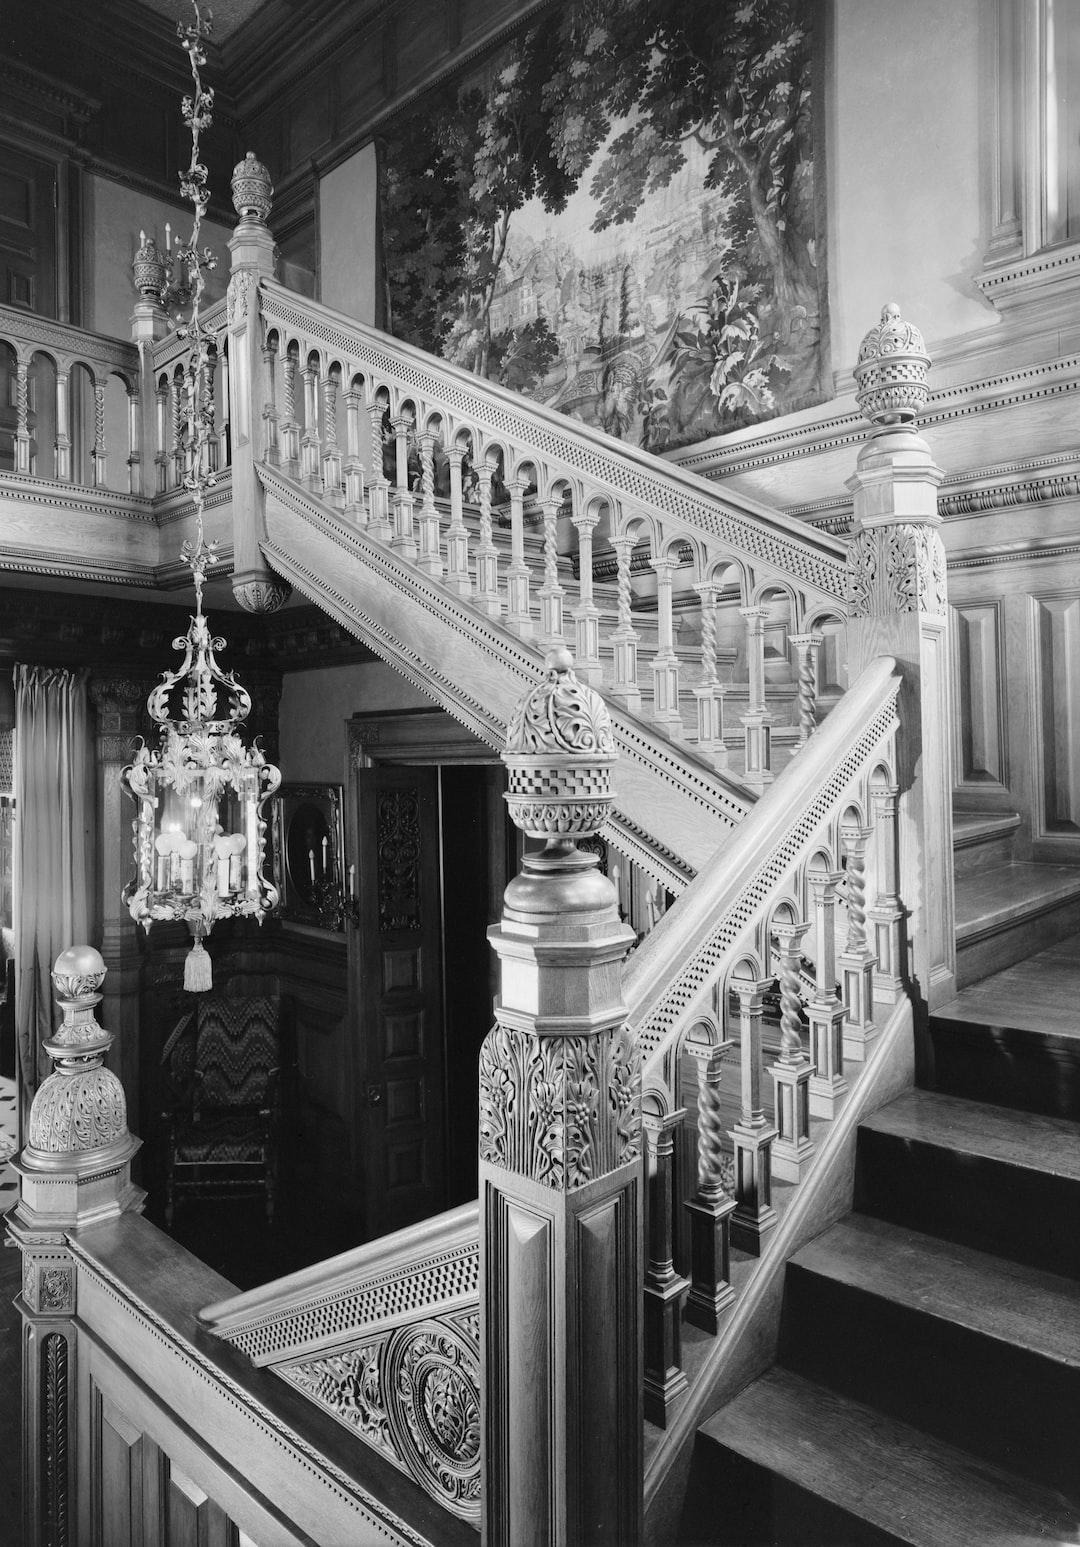 James C. Burbank House -- Stairhall, 432 Summit Avenue, Saint Paul, Ramsey County, MN. Photograph by Jack E. Boucher, 1960. From the Historic American Buildings Survey, HABS MINN,62-SAIPA,13-.  https://www.loc.gov/item/mn0010/.